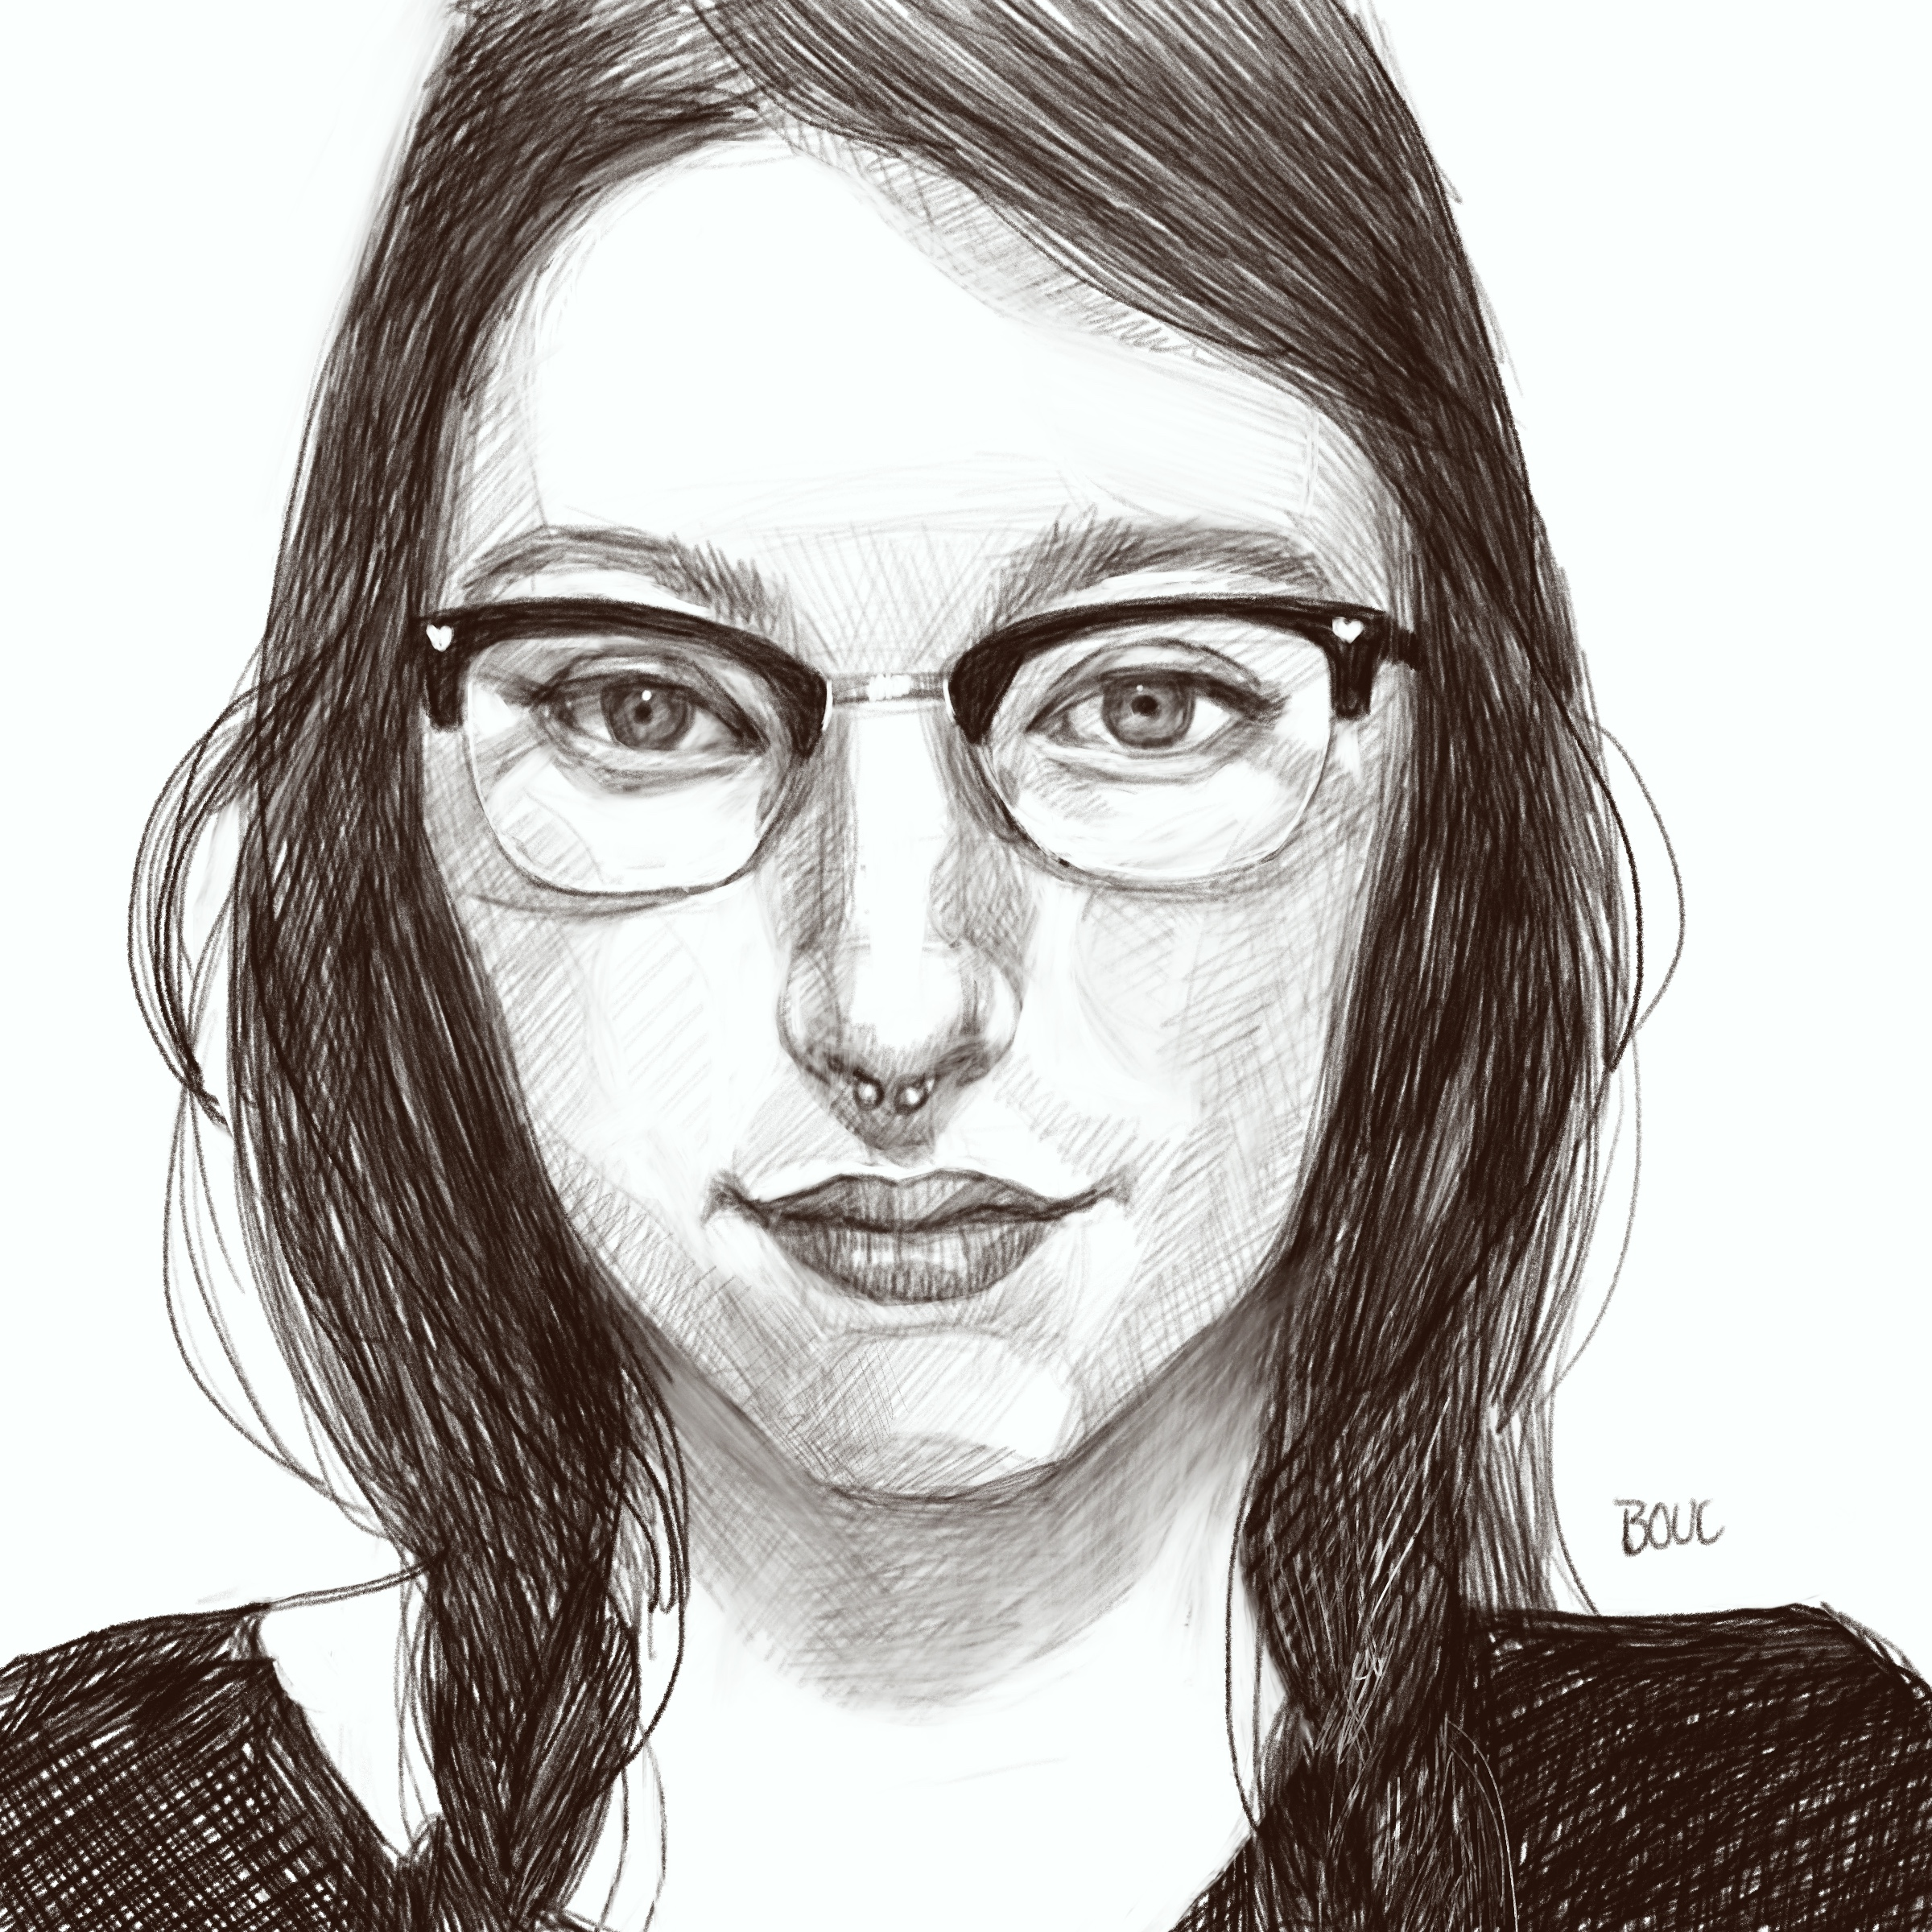 Sketch of artist Makenna Snyder from her photo on Sktchy app in Procreate